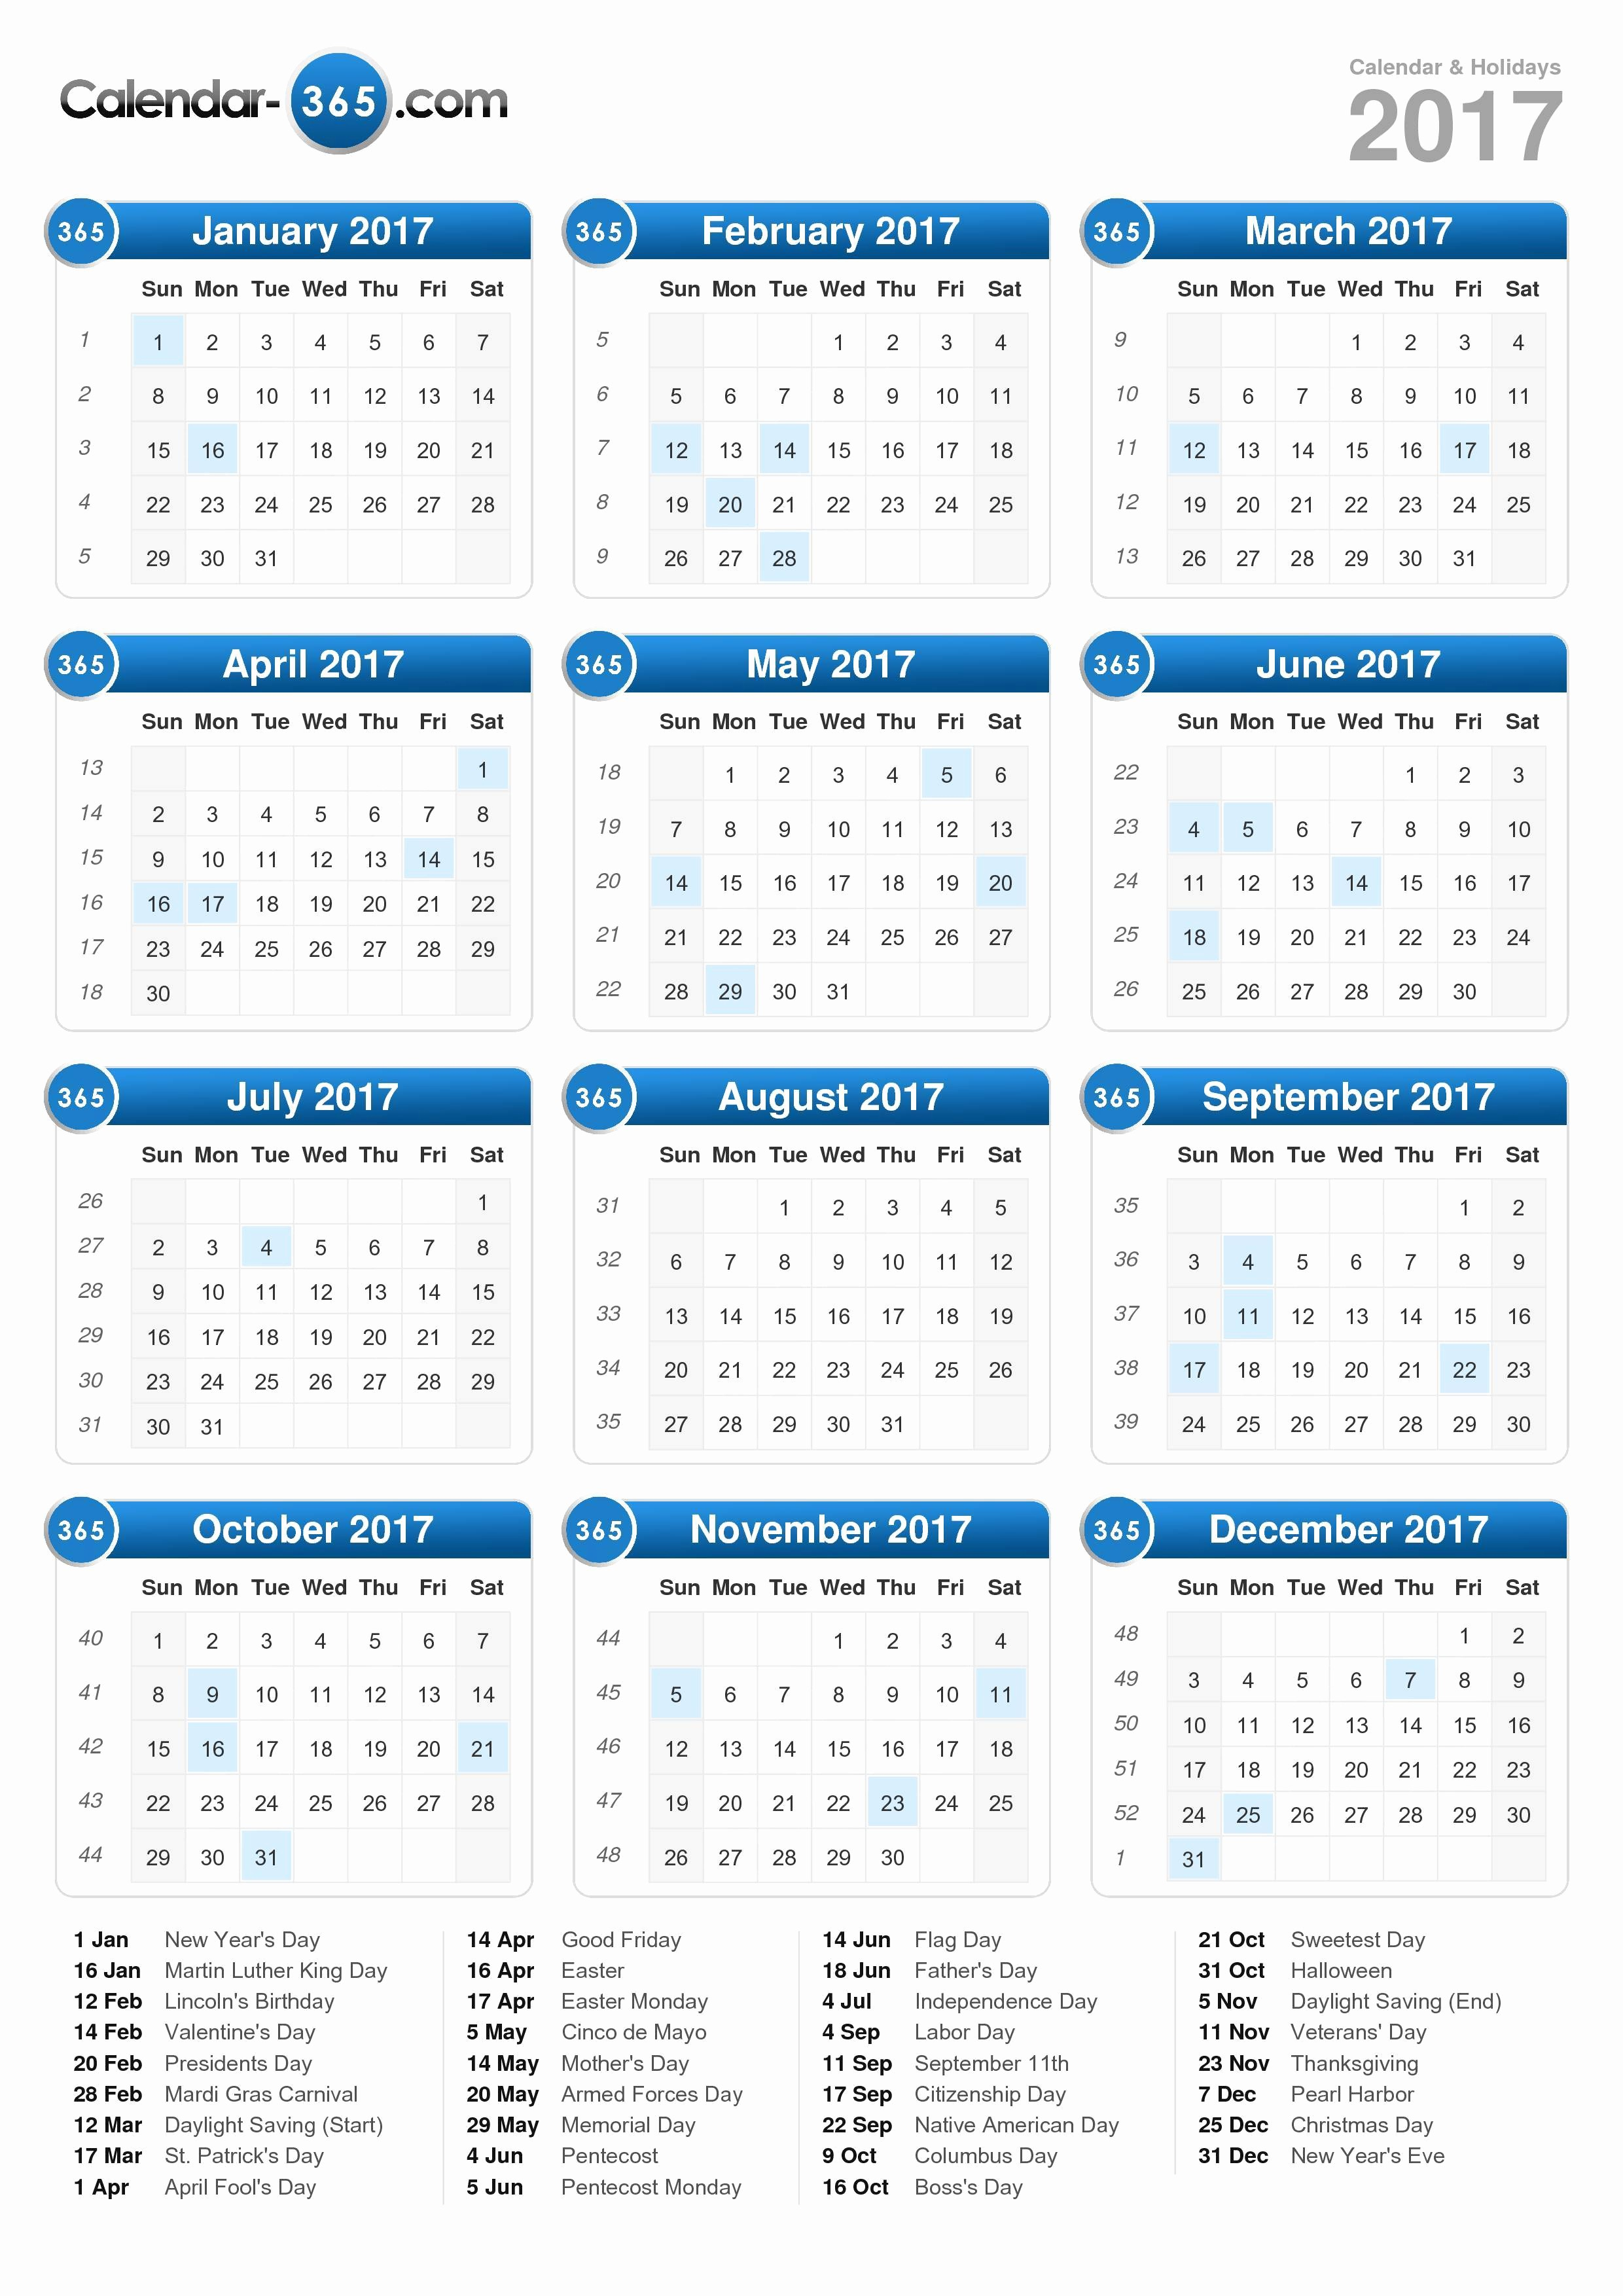 Calendar 2017 Template with Holidays Awesome 2017 Calendar